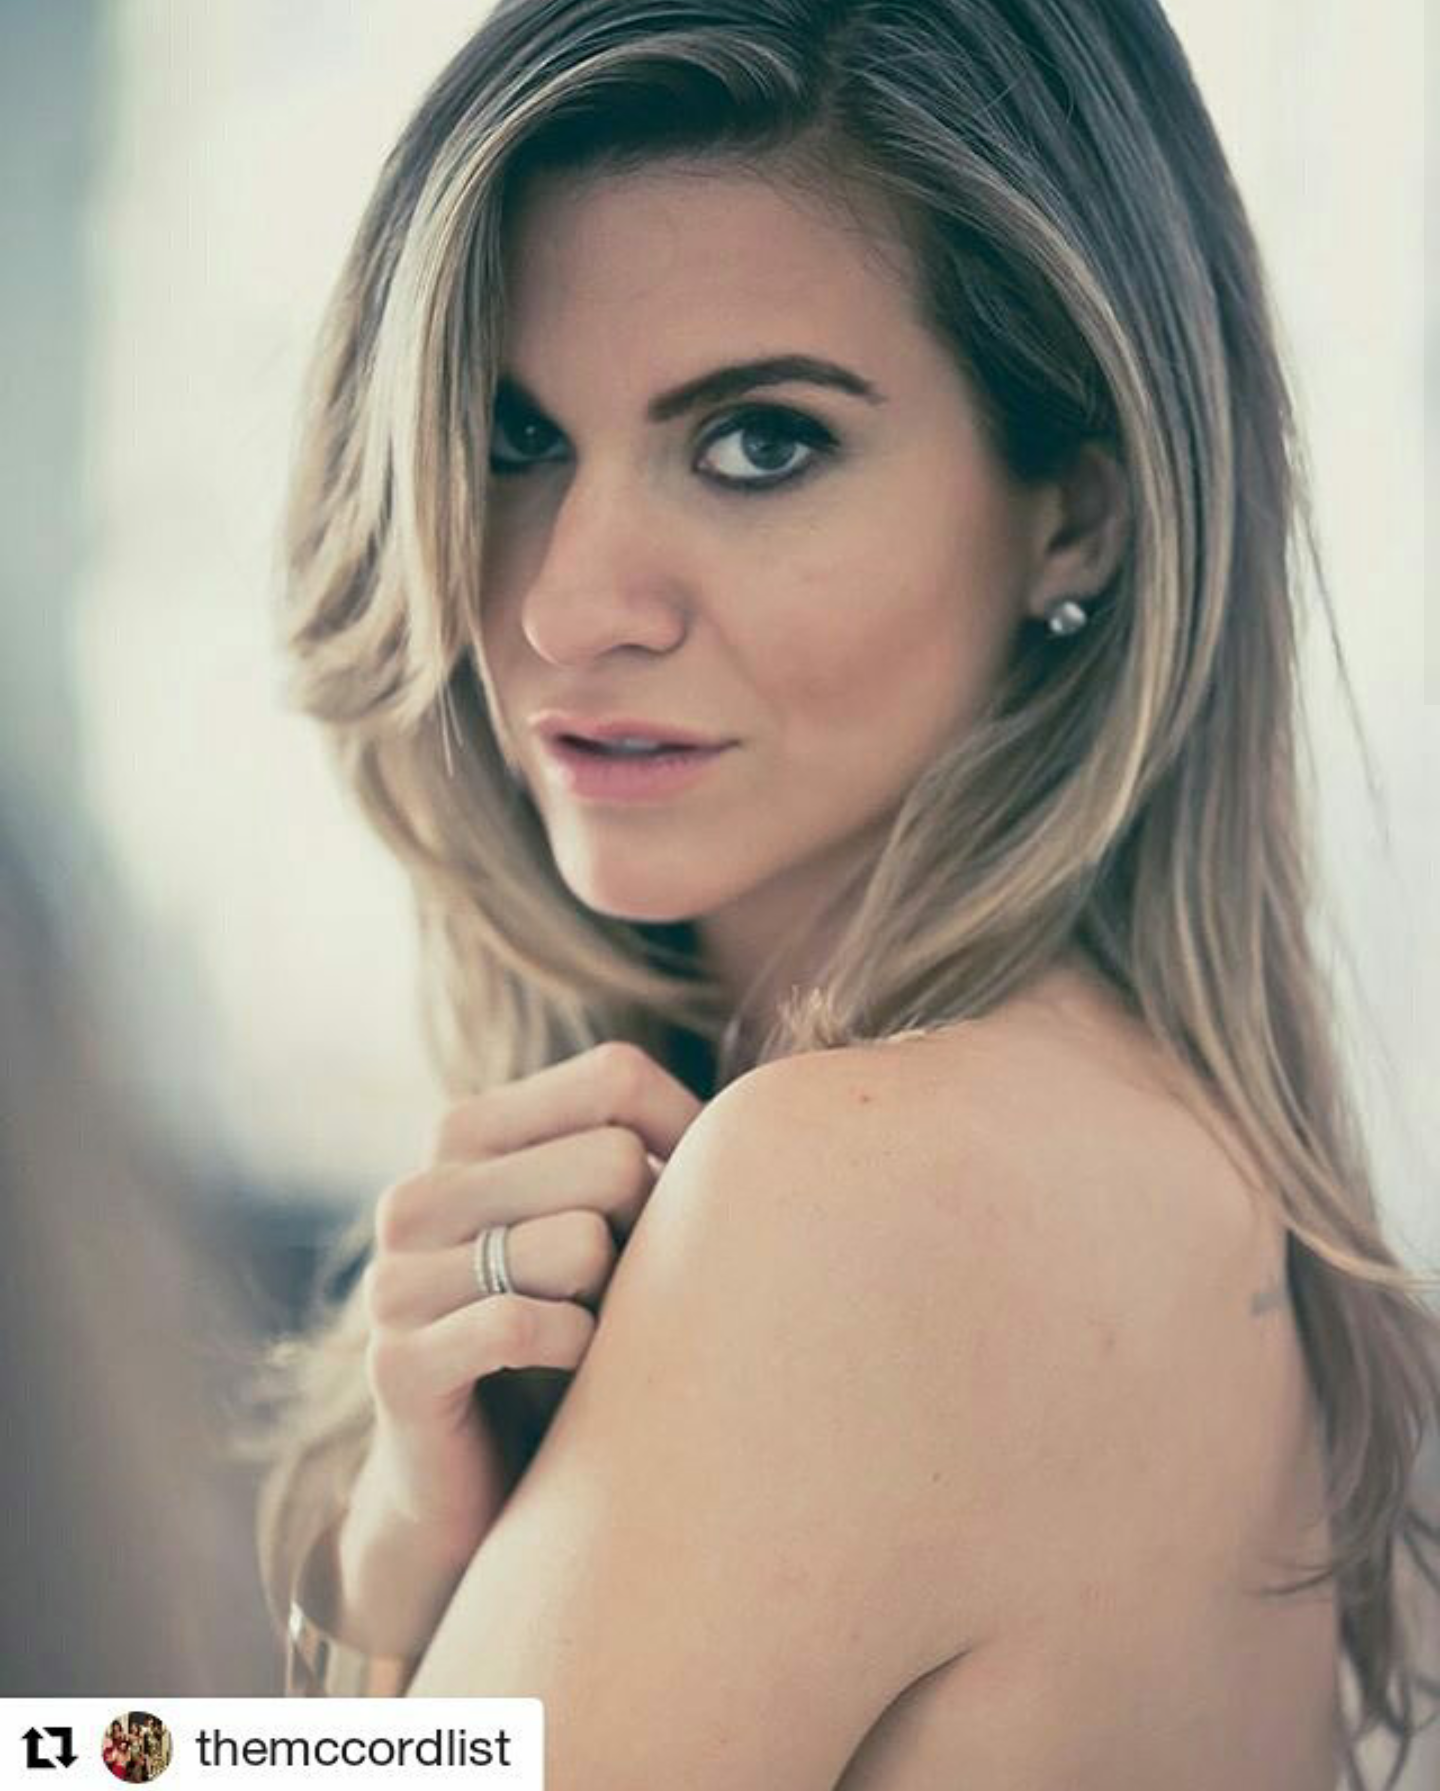 Rachel McCord